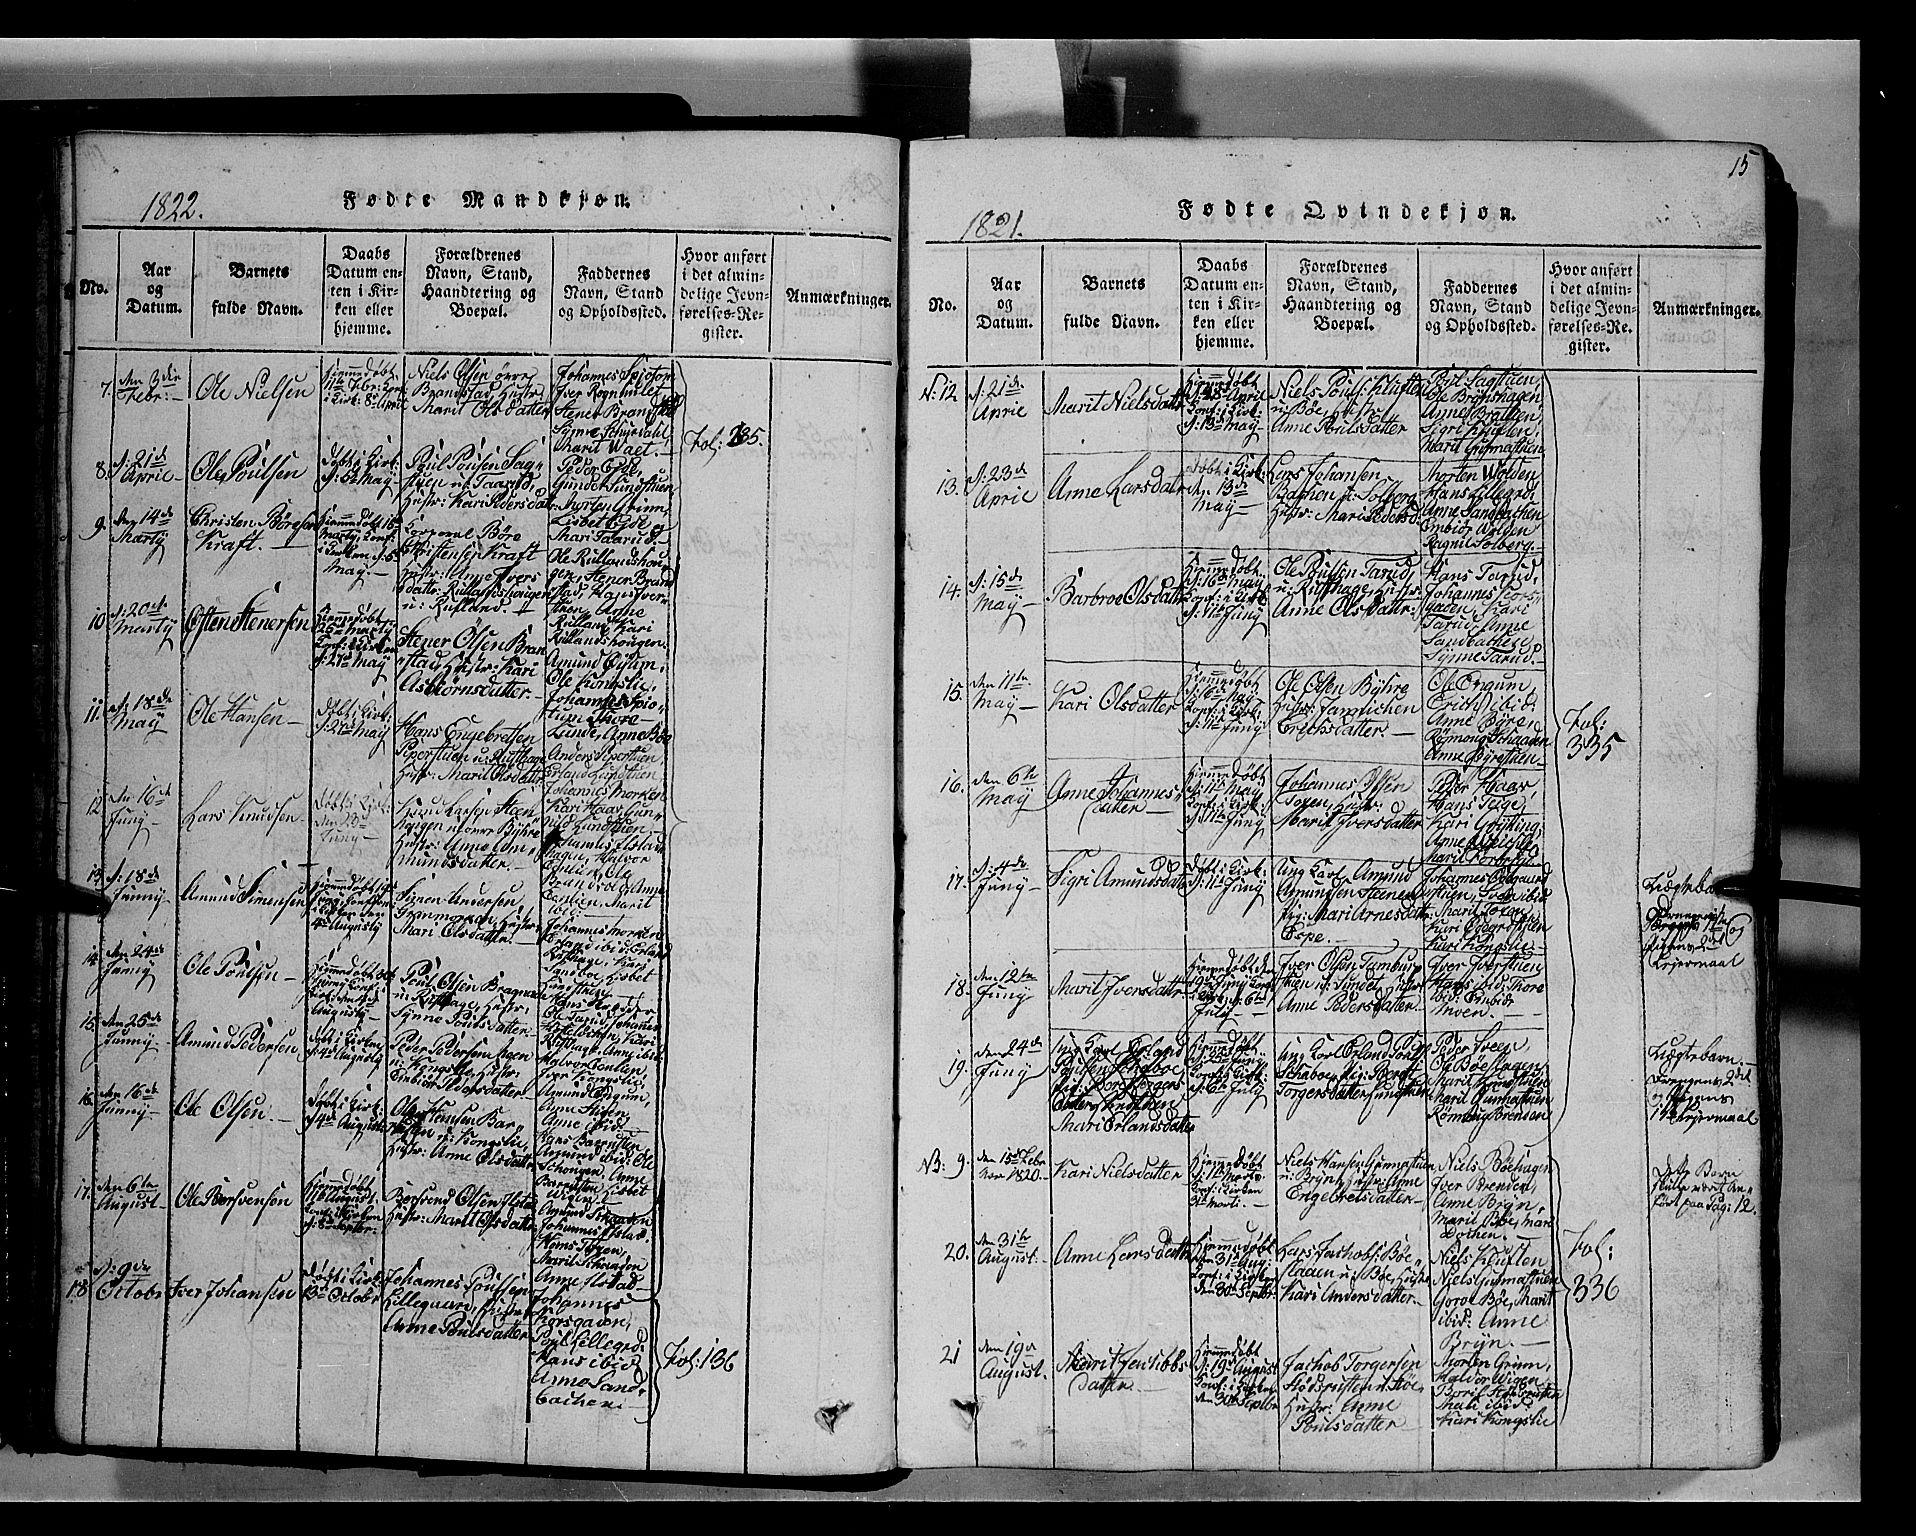 SAH, Fron prestekontor, H/Ha/Hab/L0004: Klokkerbok nr. 4, 1816-1850, s. 15